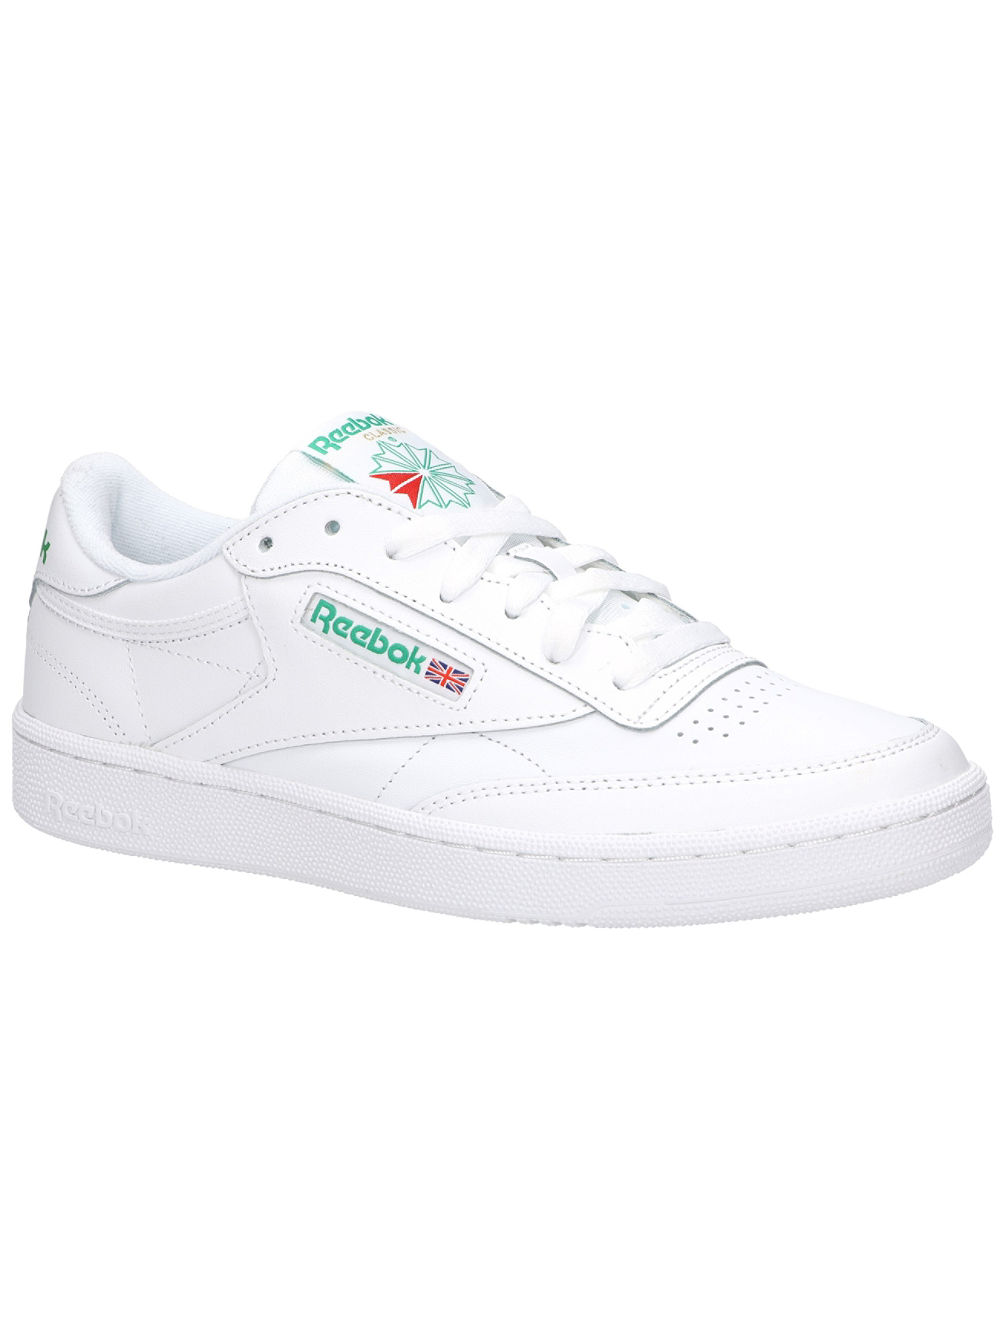 8a28124e0e5 Buy Reebok Club C85 Sneakers online at Blue Tomato